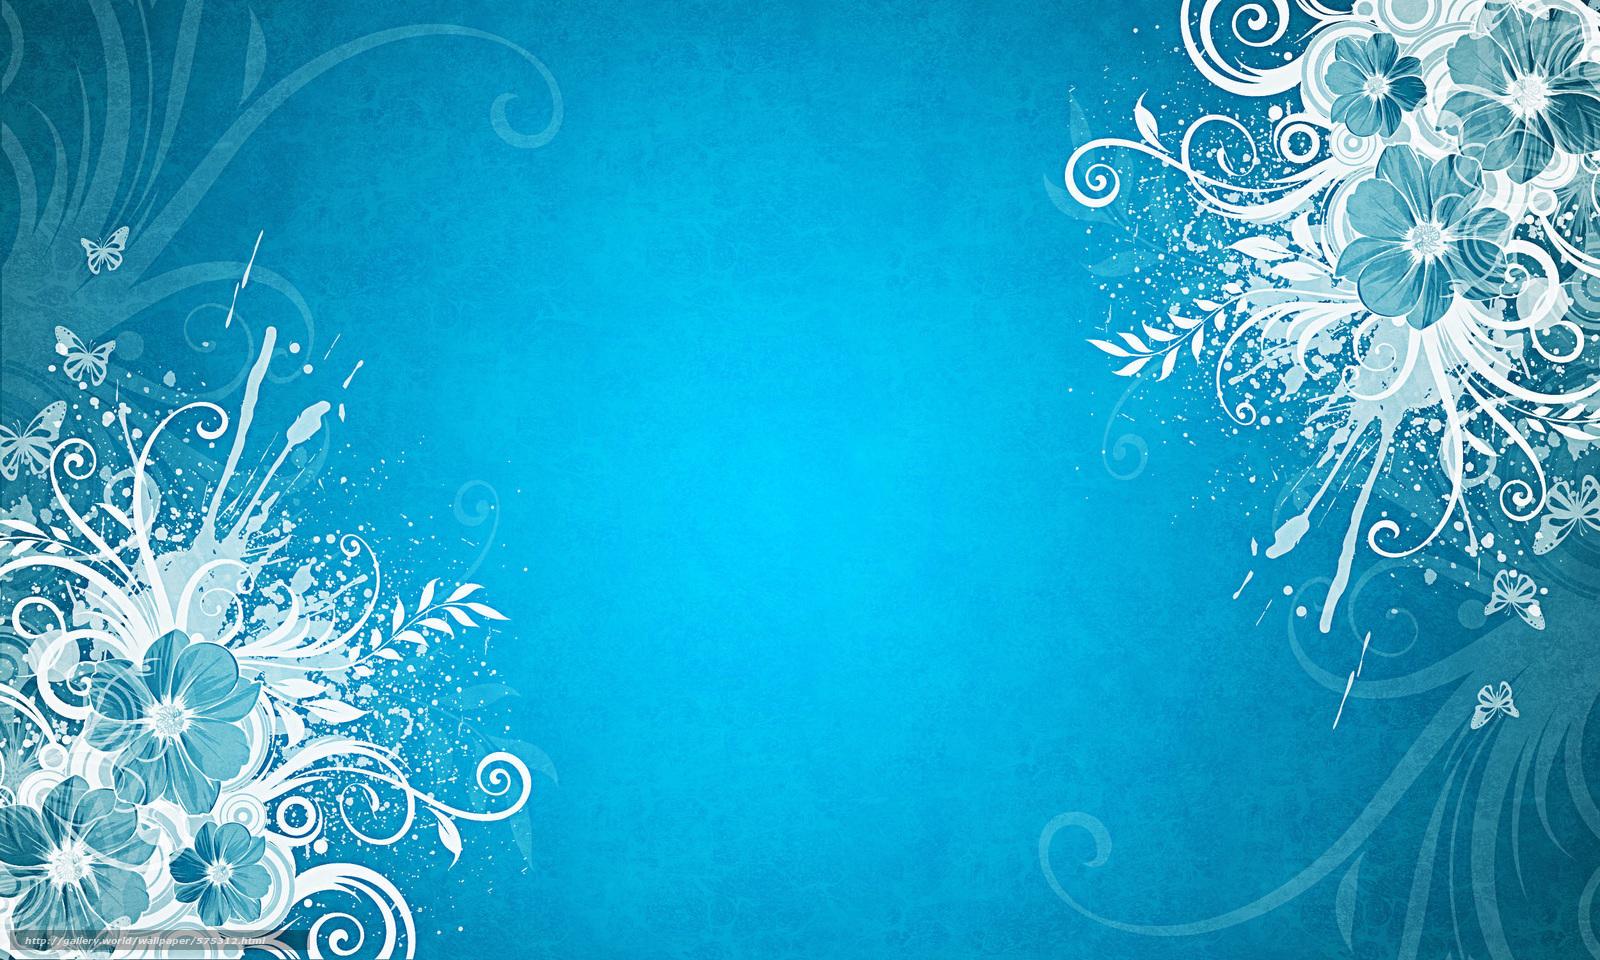 Scaricare gli sfondi sfondo blu farfalle fiori sfondi for Sfondi farfalle gratis